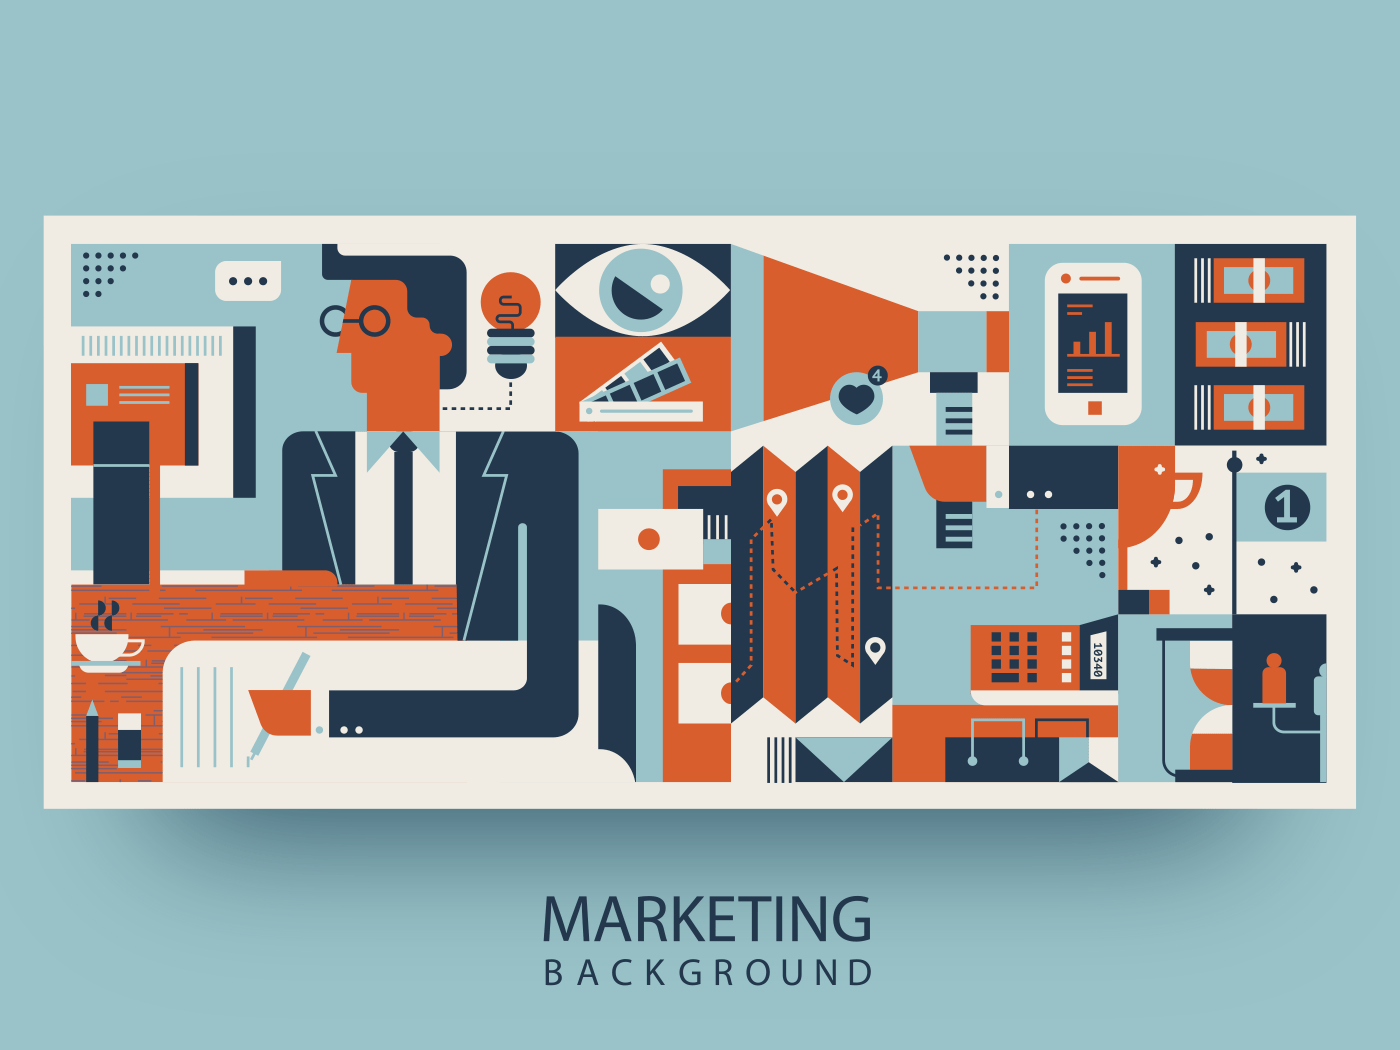 Marketing abstract background illustration